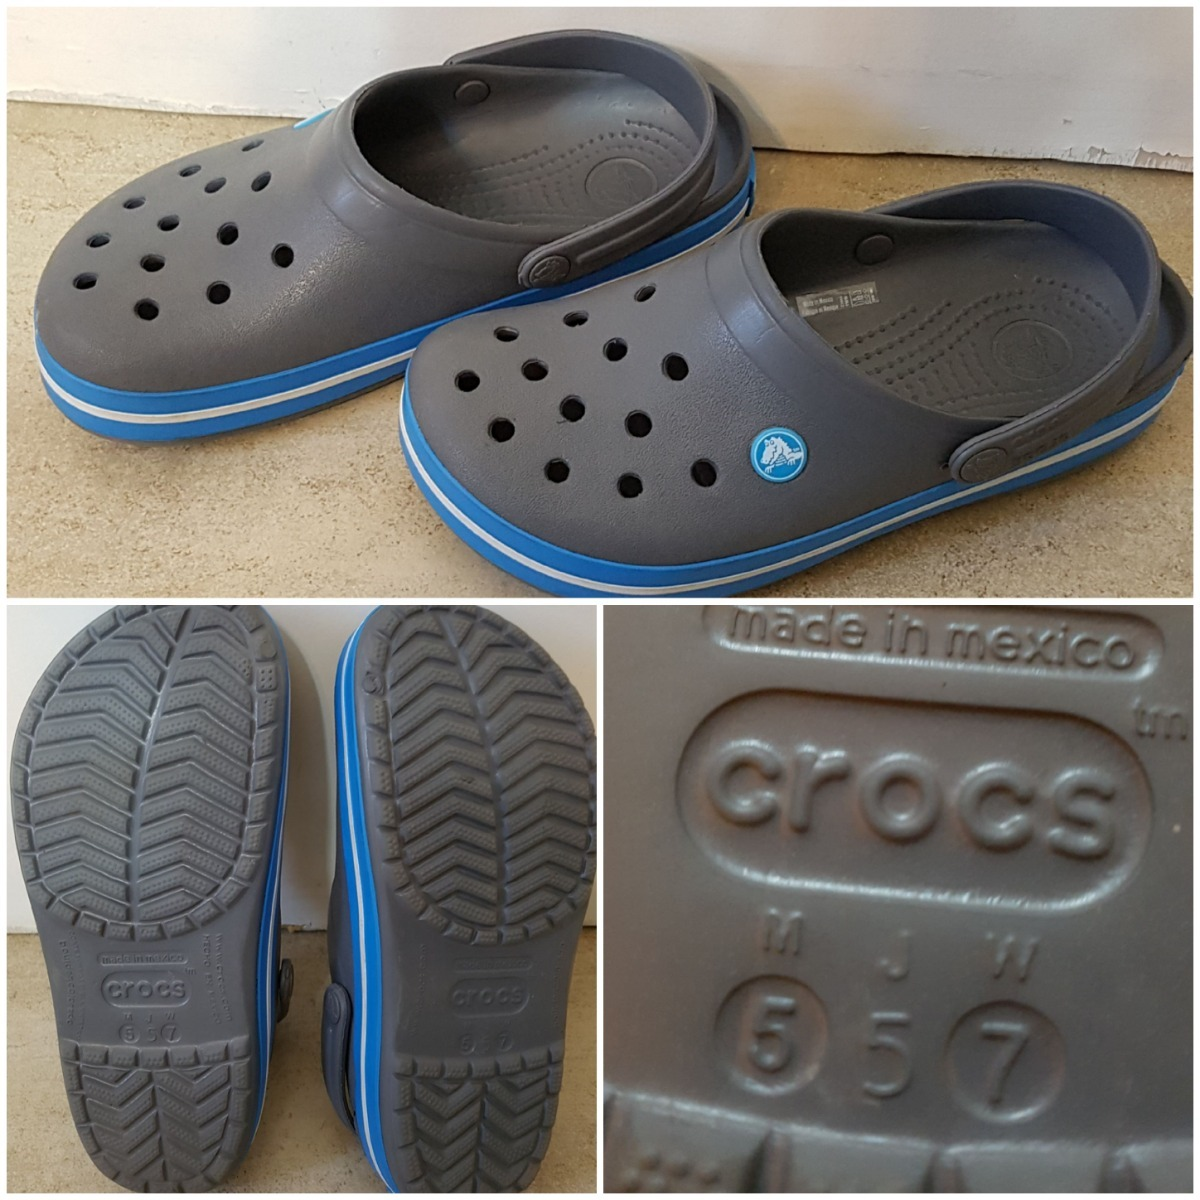 913e089b809 crocs sandalia nueva!! t37 crocband charcoal ocean. Cargando zoom.